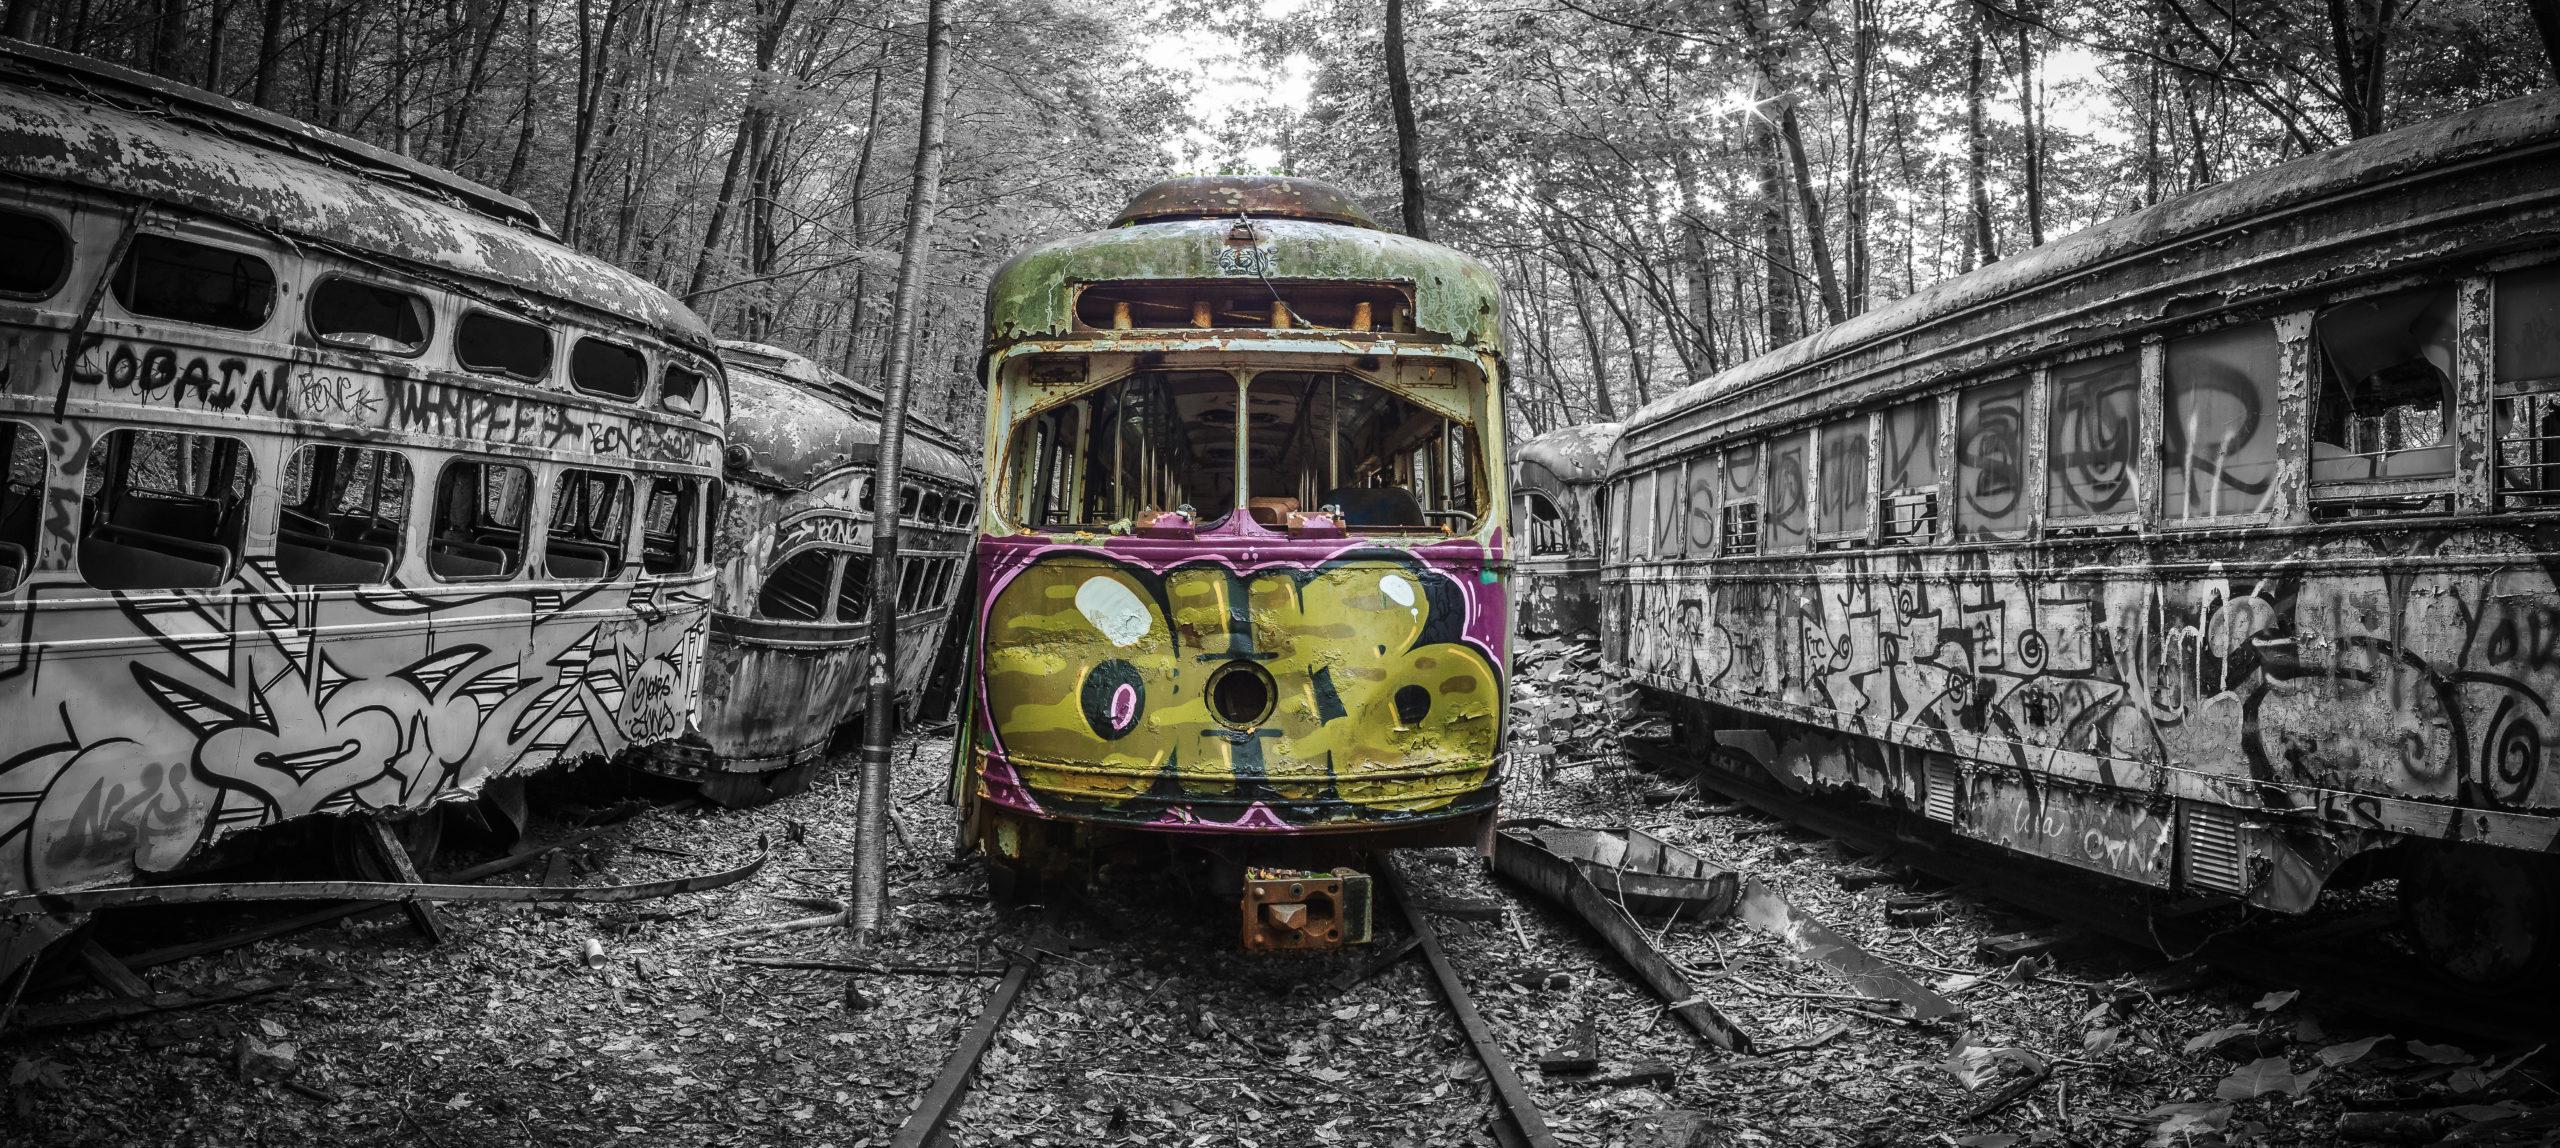 Trolley Graveyard by Michael Hower